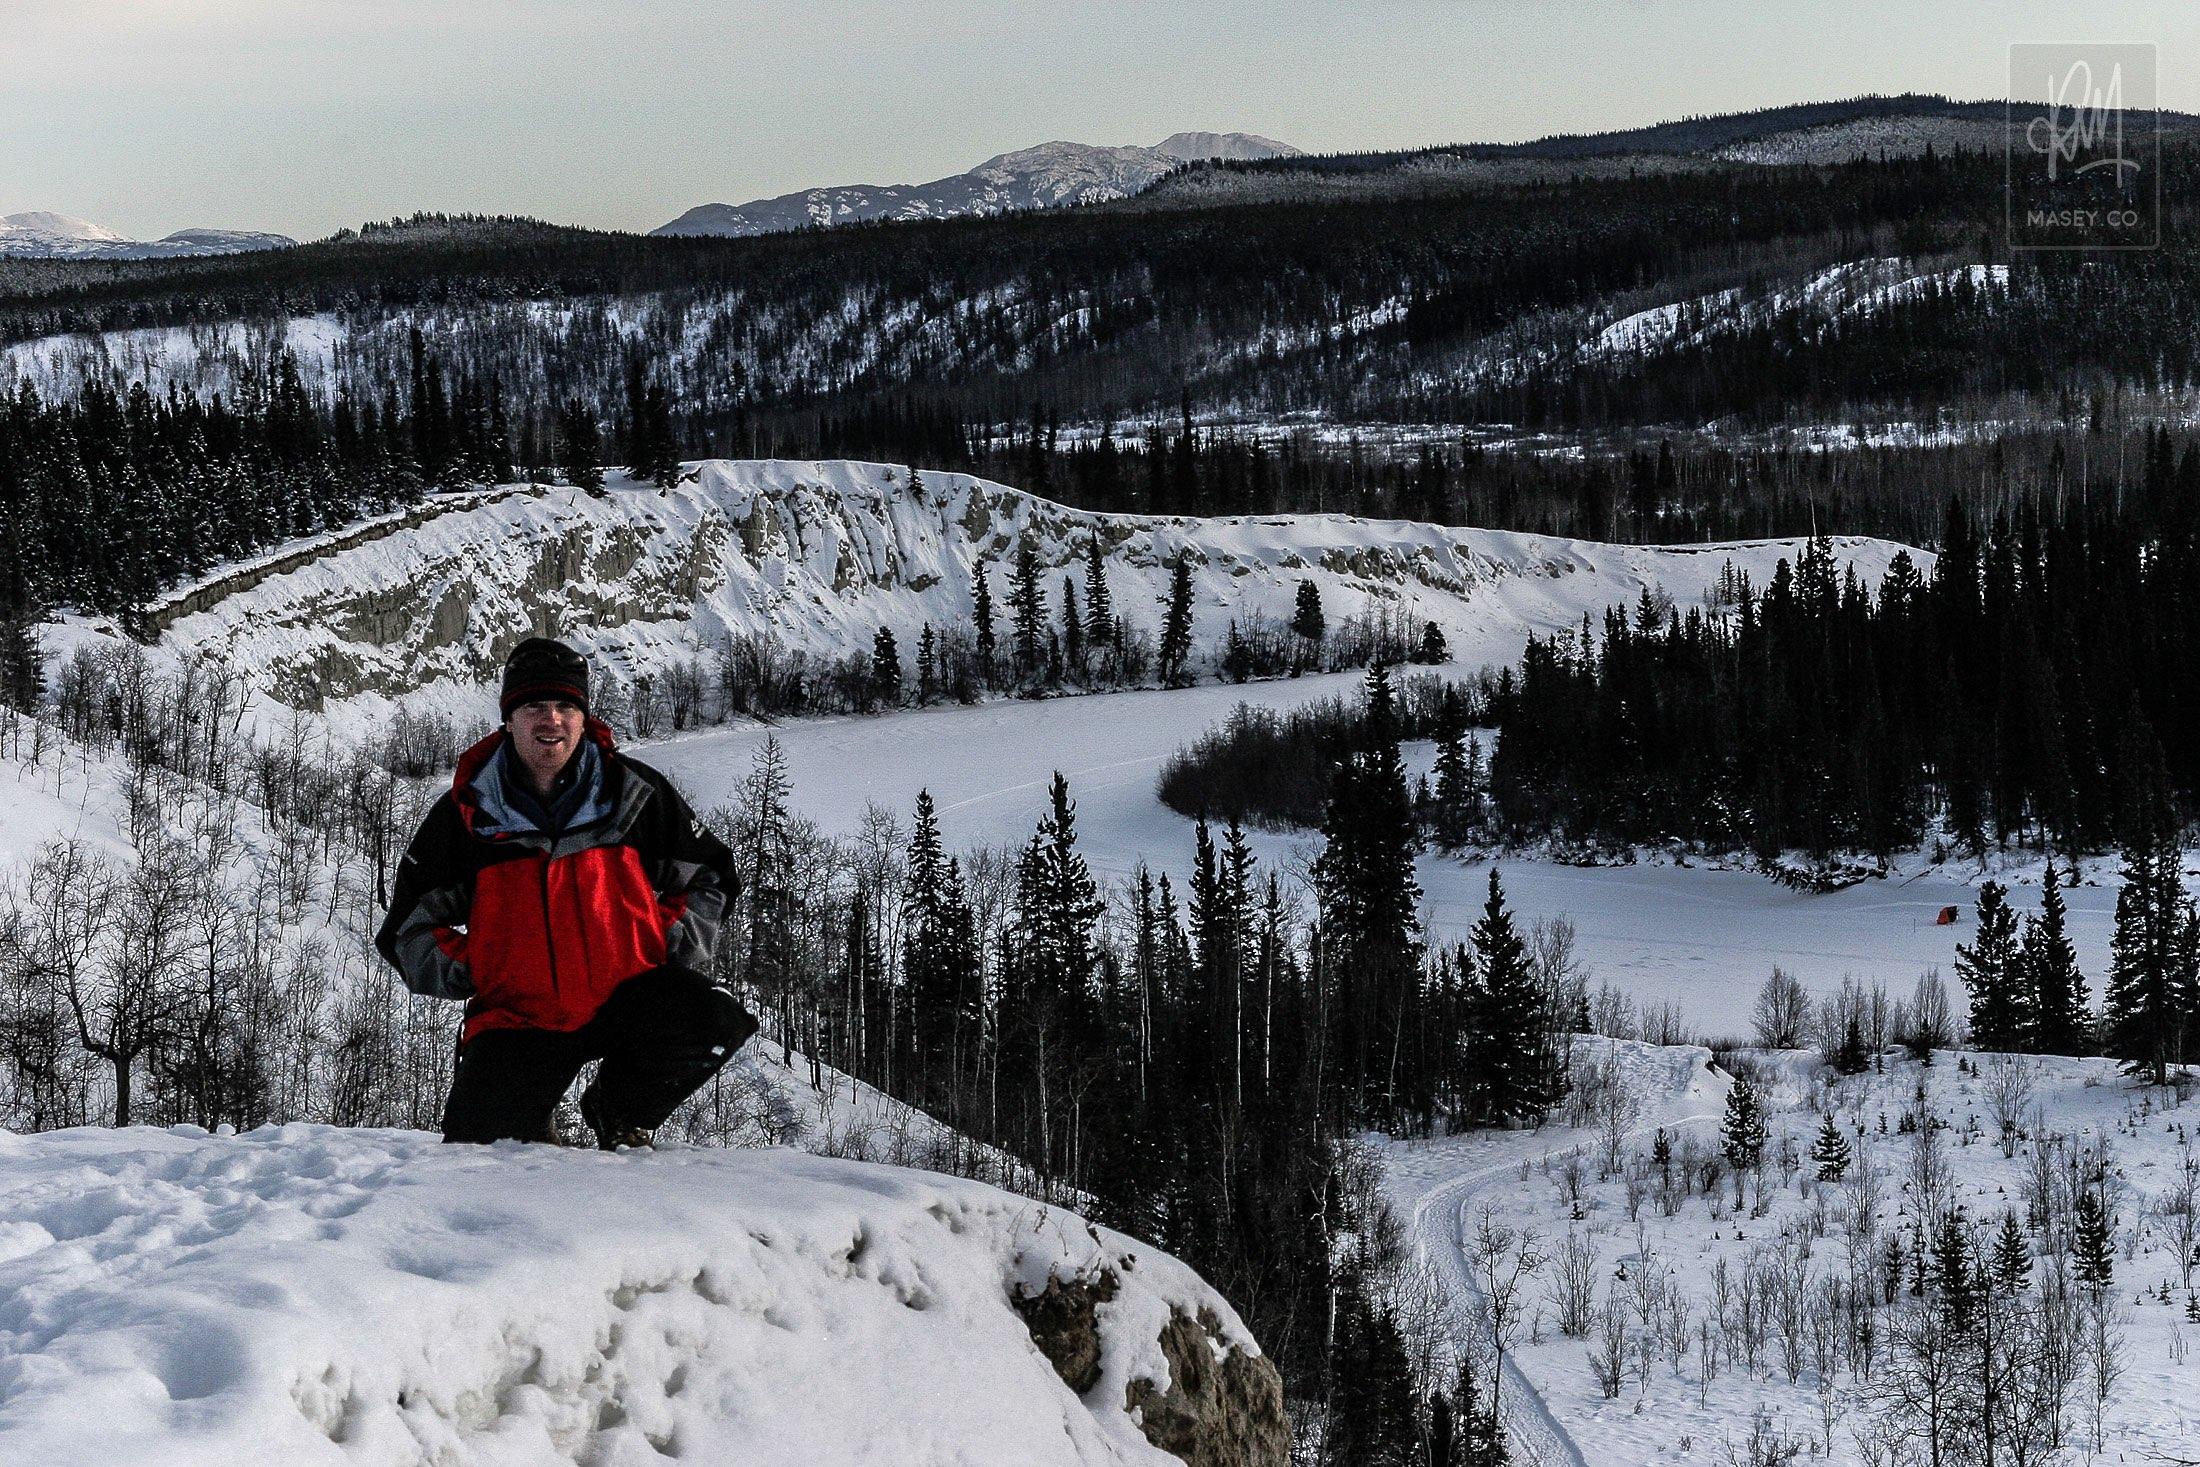 2007 Yukon Quest - Whitehorse, Yukon